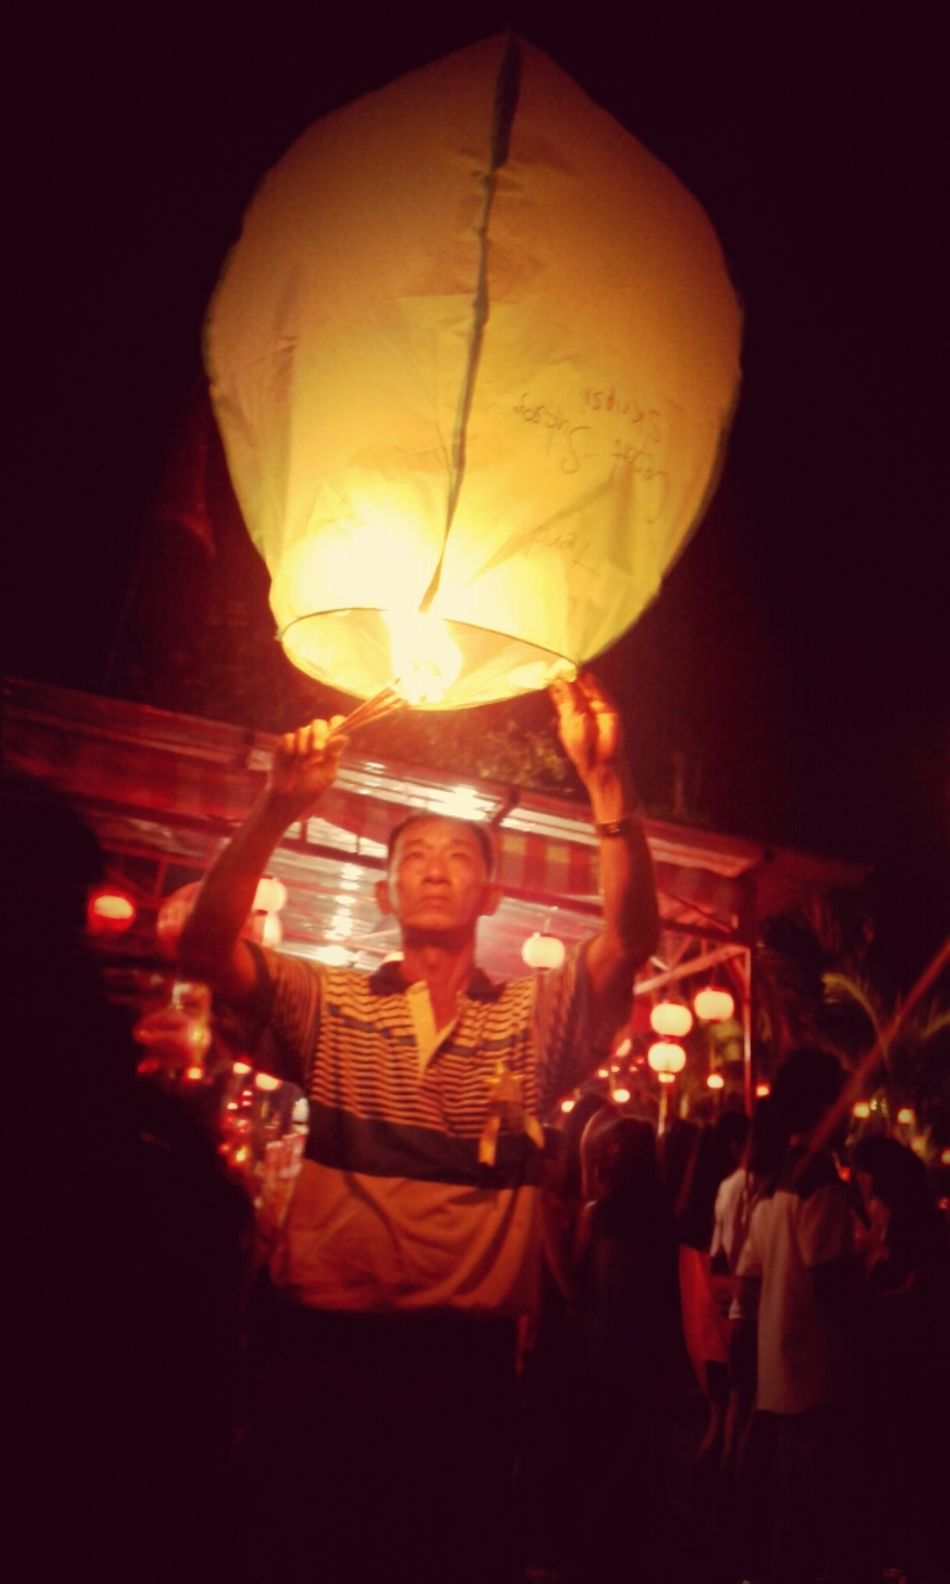 the culture of chinatown senggarang Chinatown Culture Tanjungpinang Senggarang